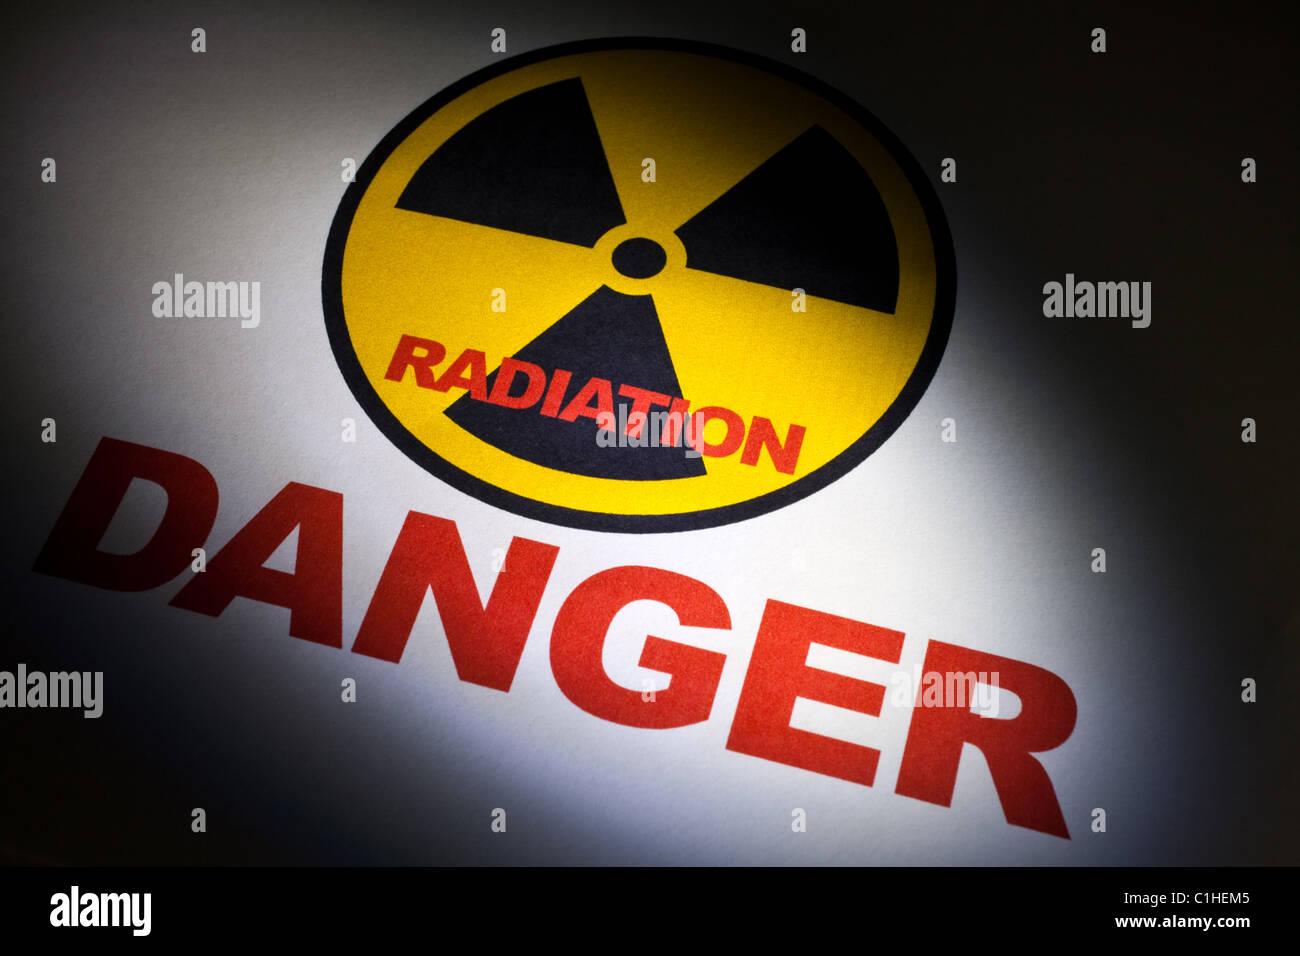 Radiation hazard sign for background - Stock Image